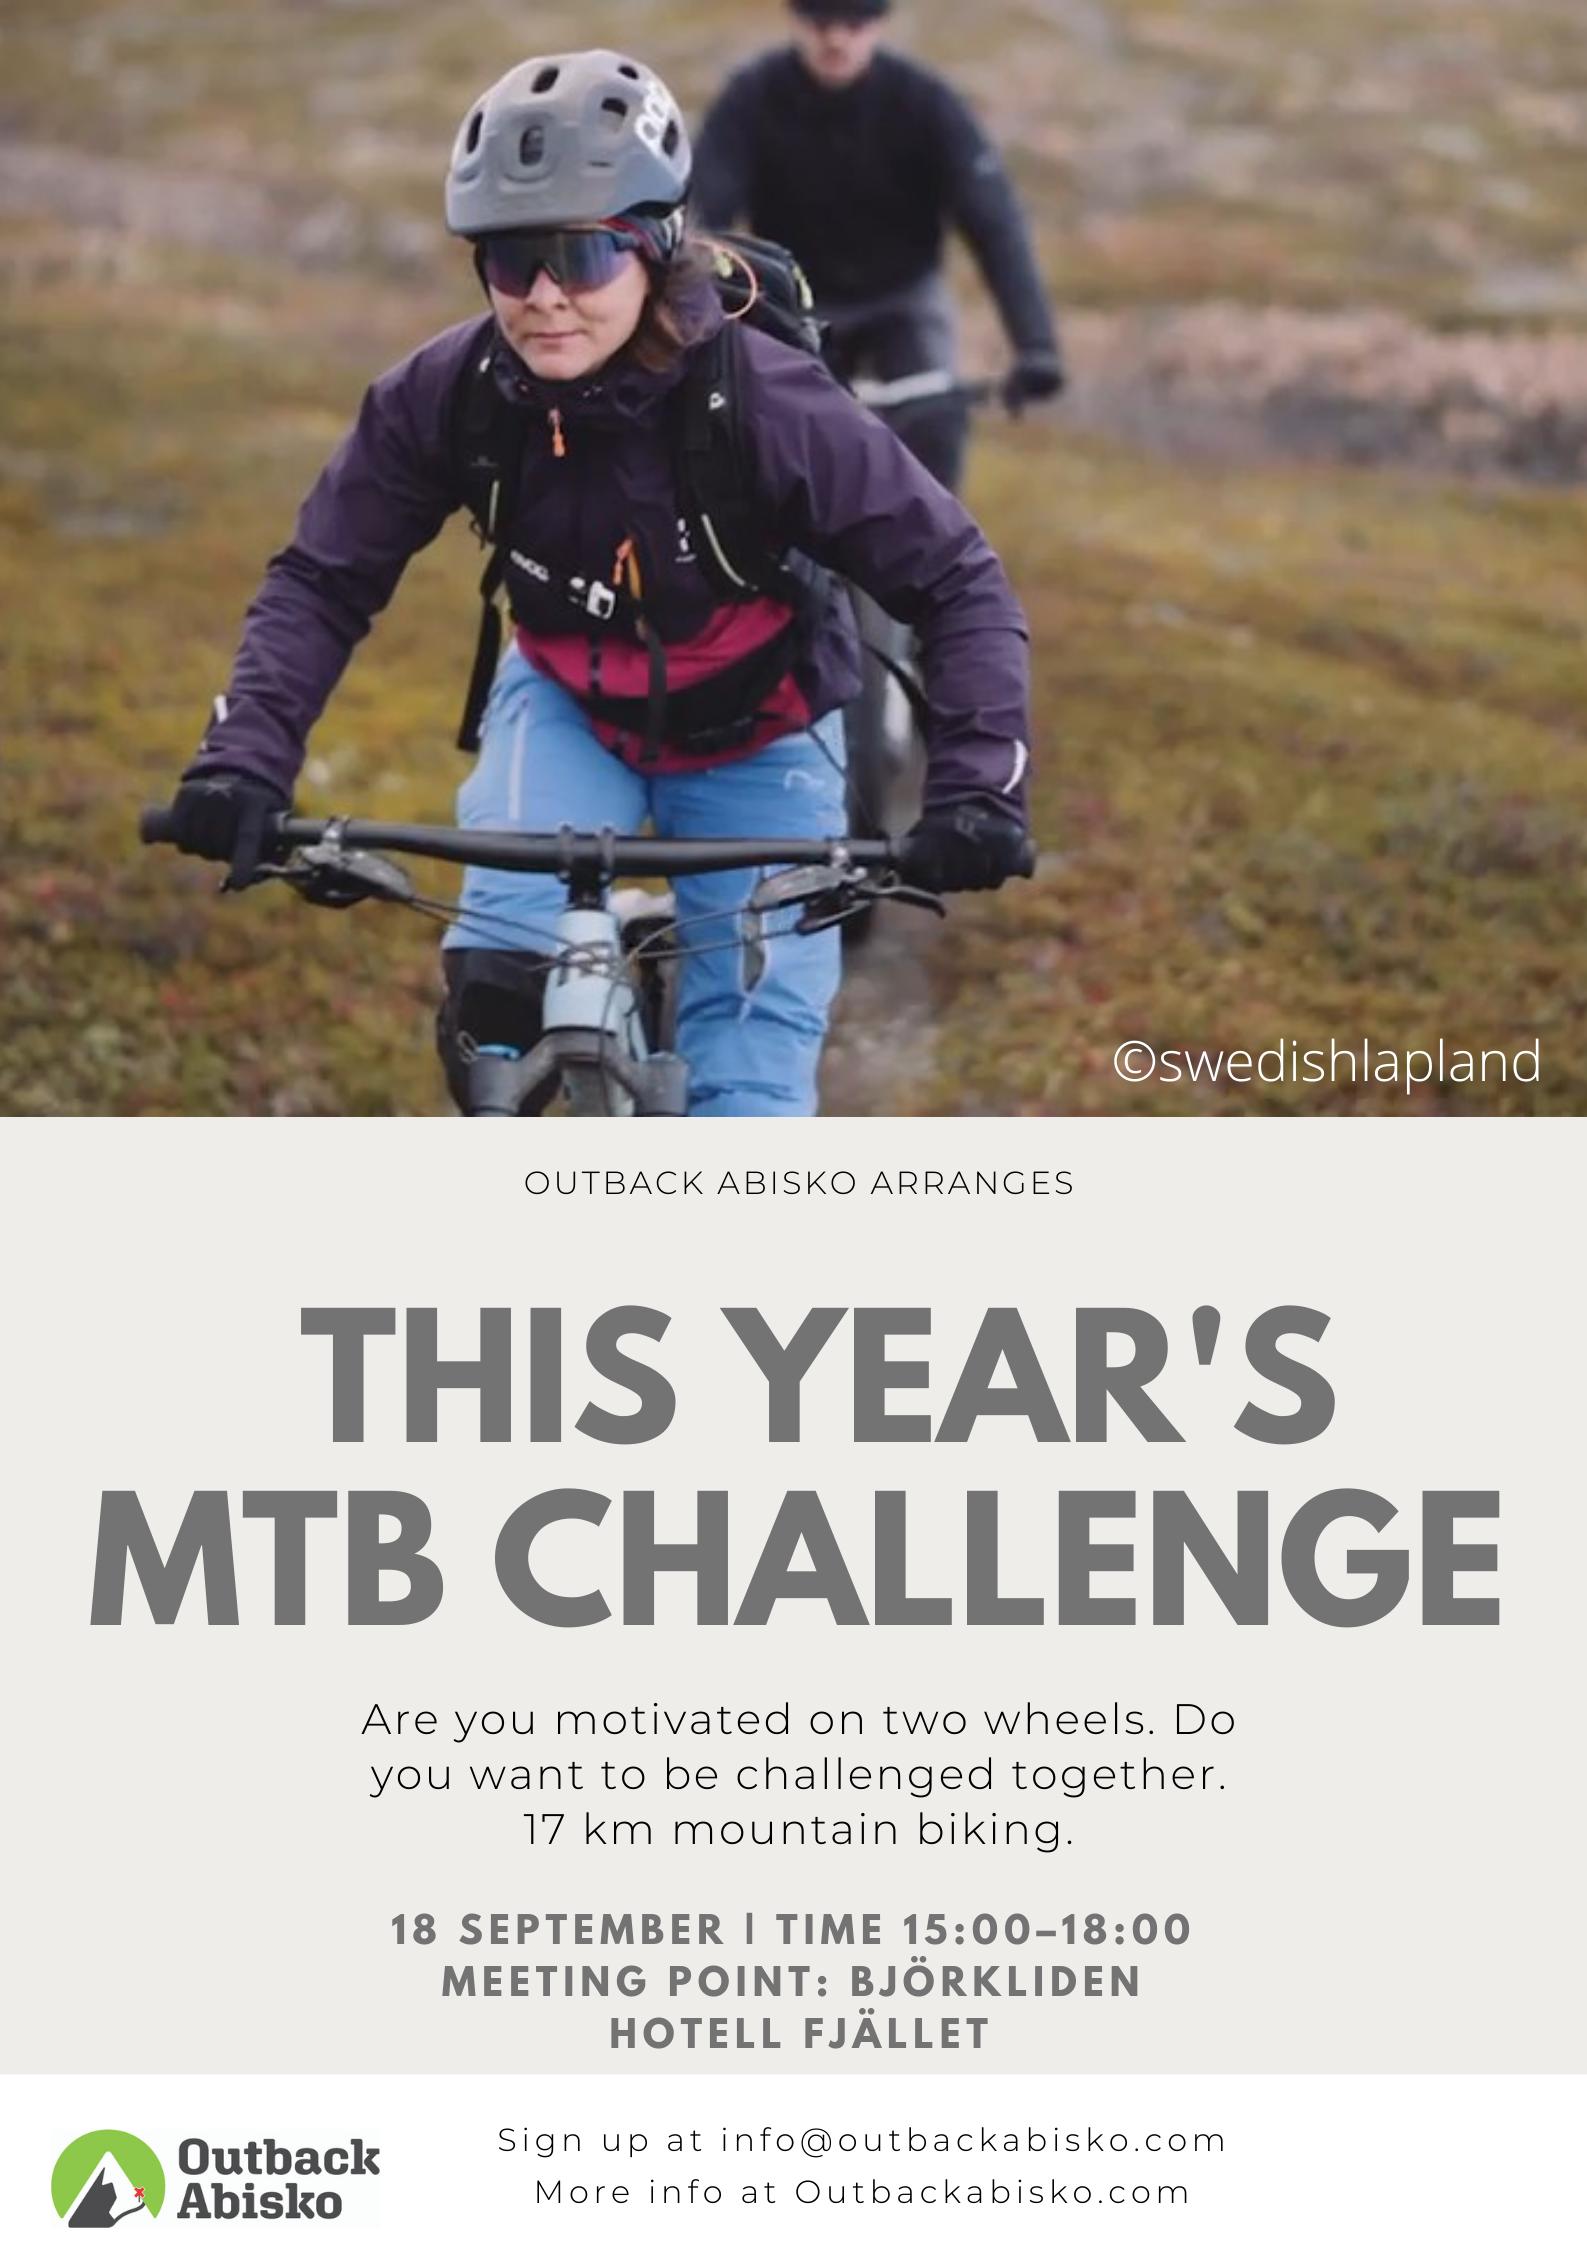 challenge mtb (2)